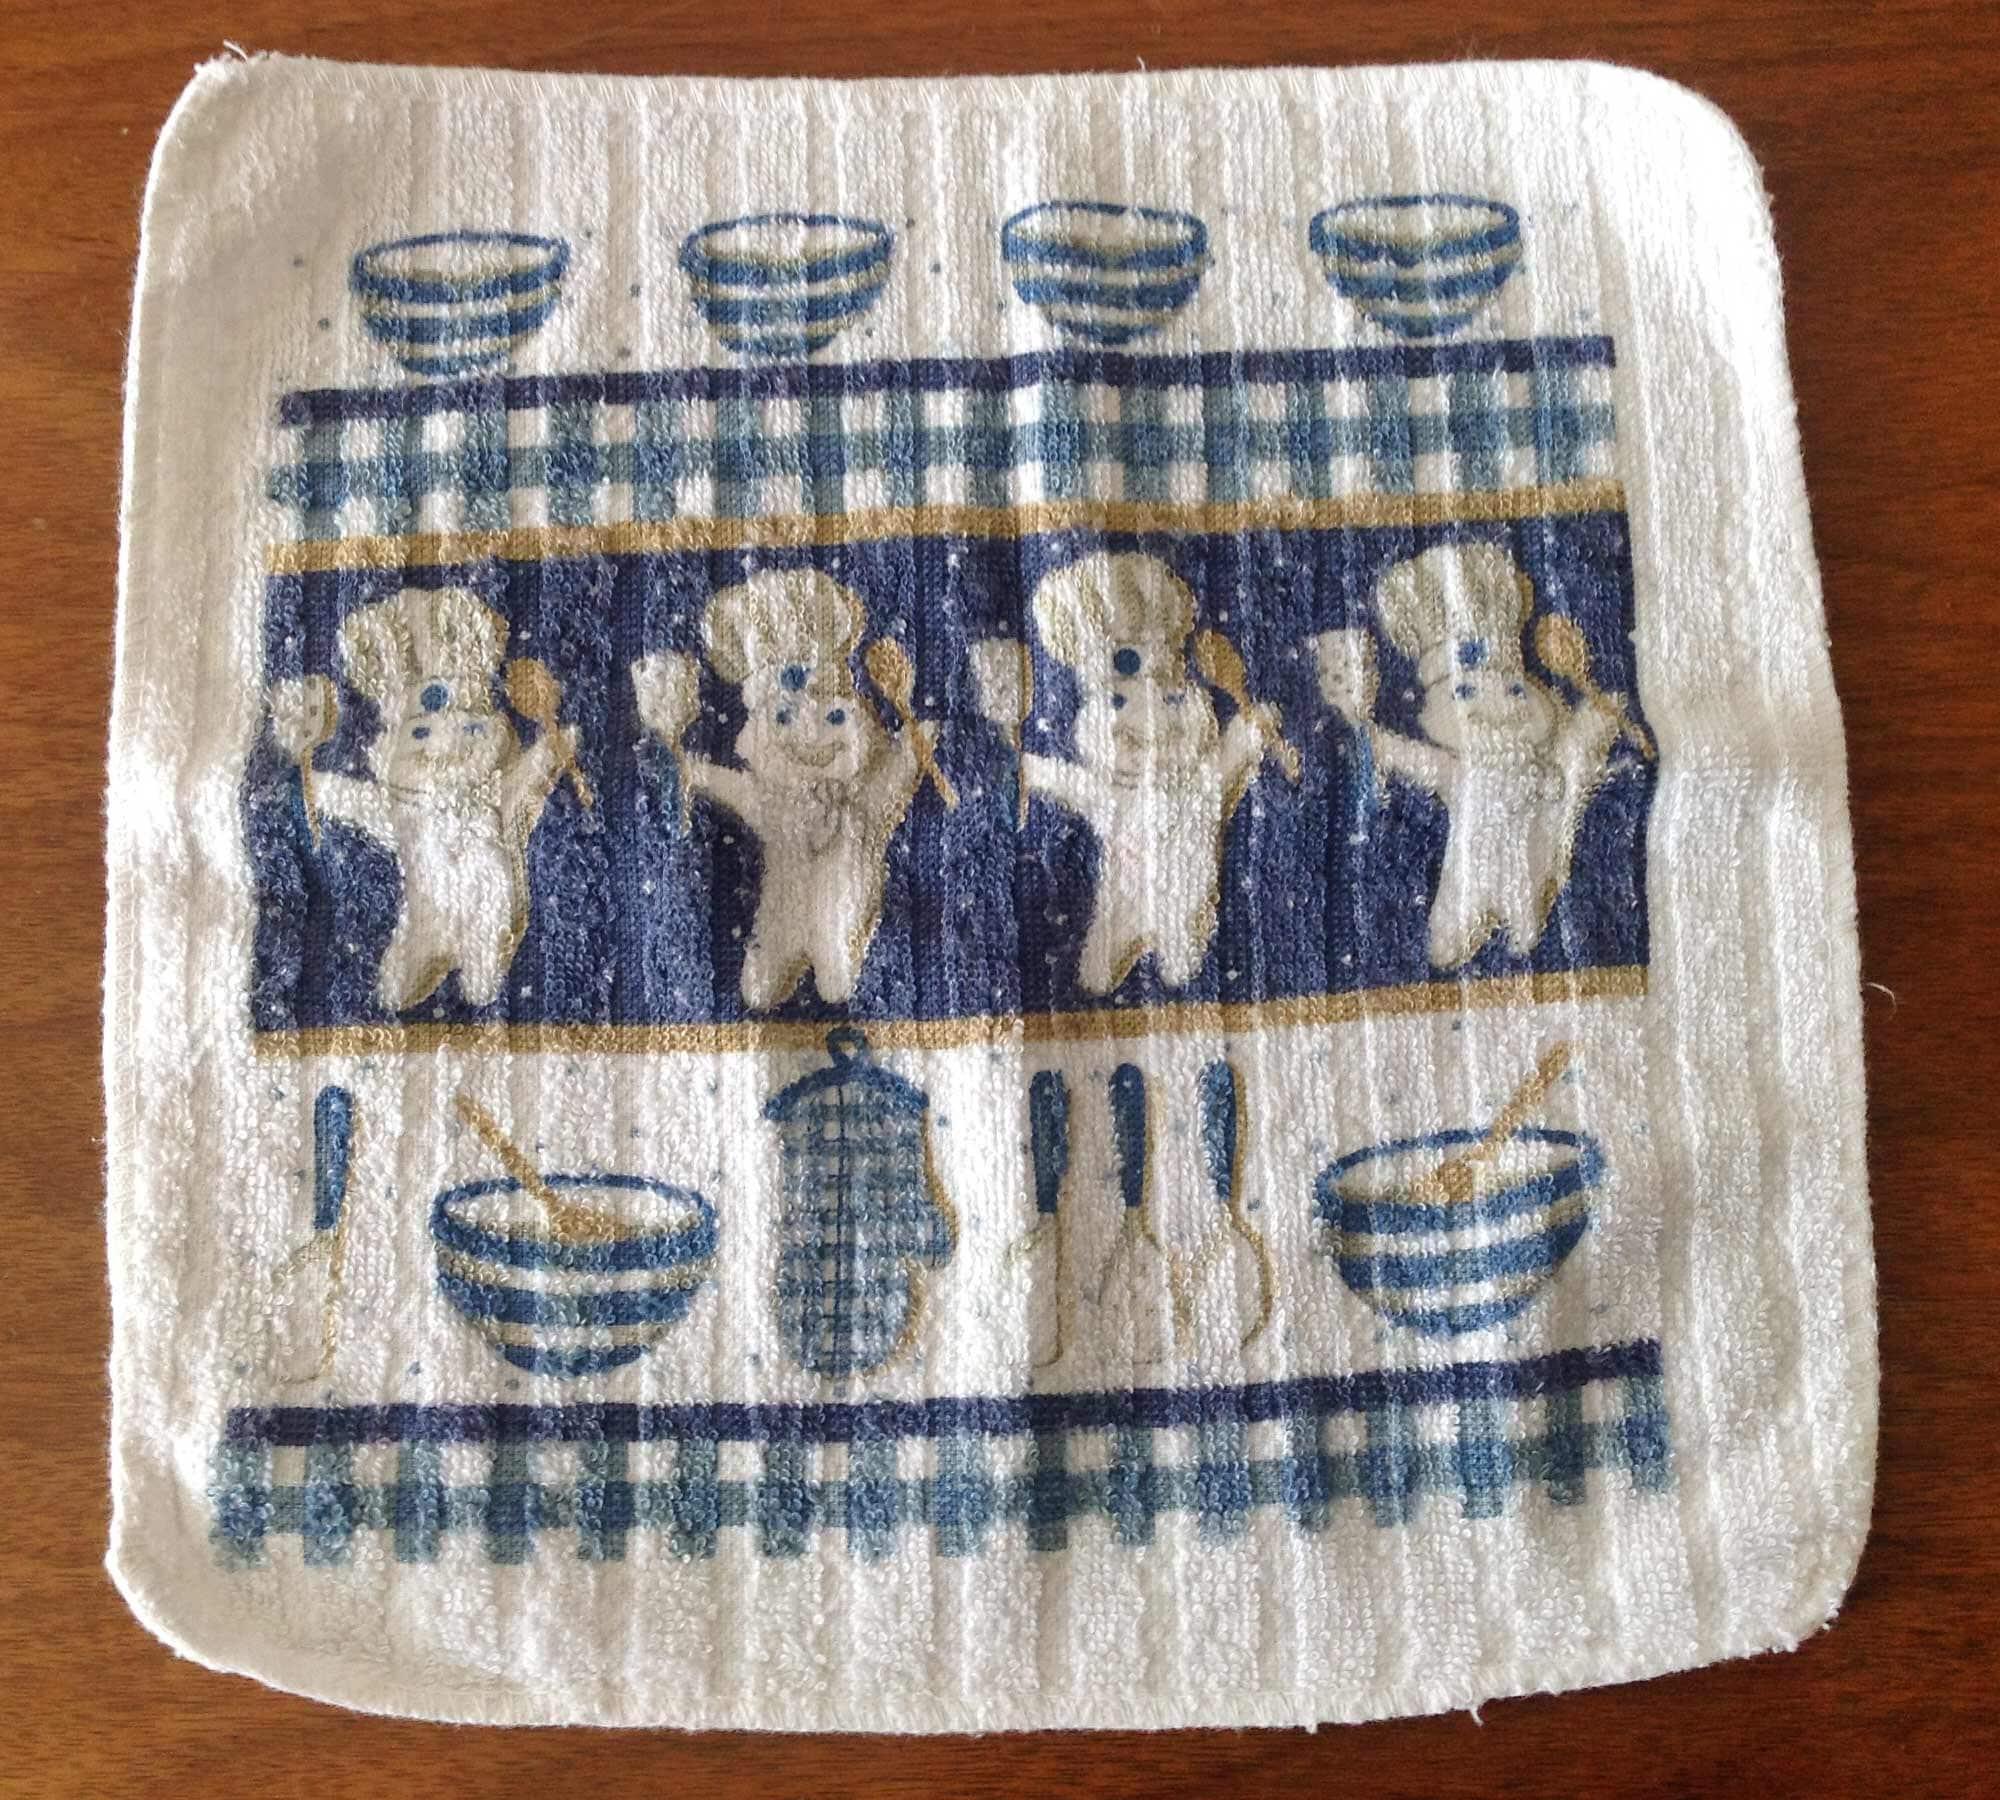 Towels Pillsbury Doughboy Kitchen Rug Www Topsimages Com